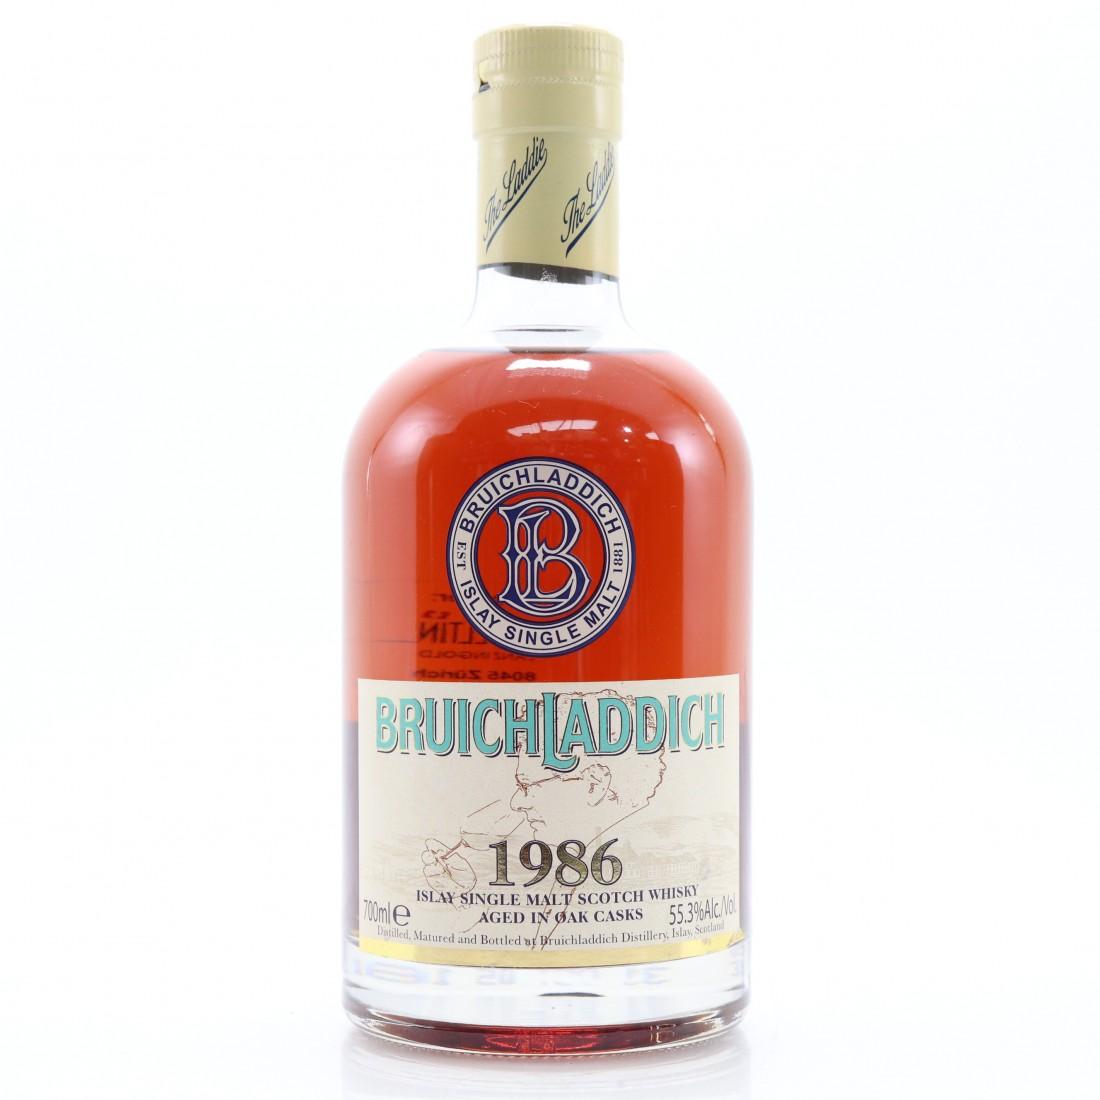 Bruichladdich 1986 Single Cask #539 / Sherry Butt